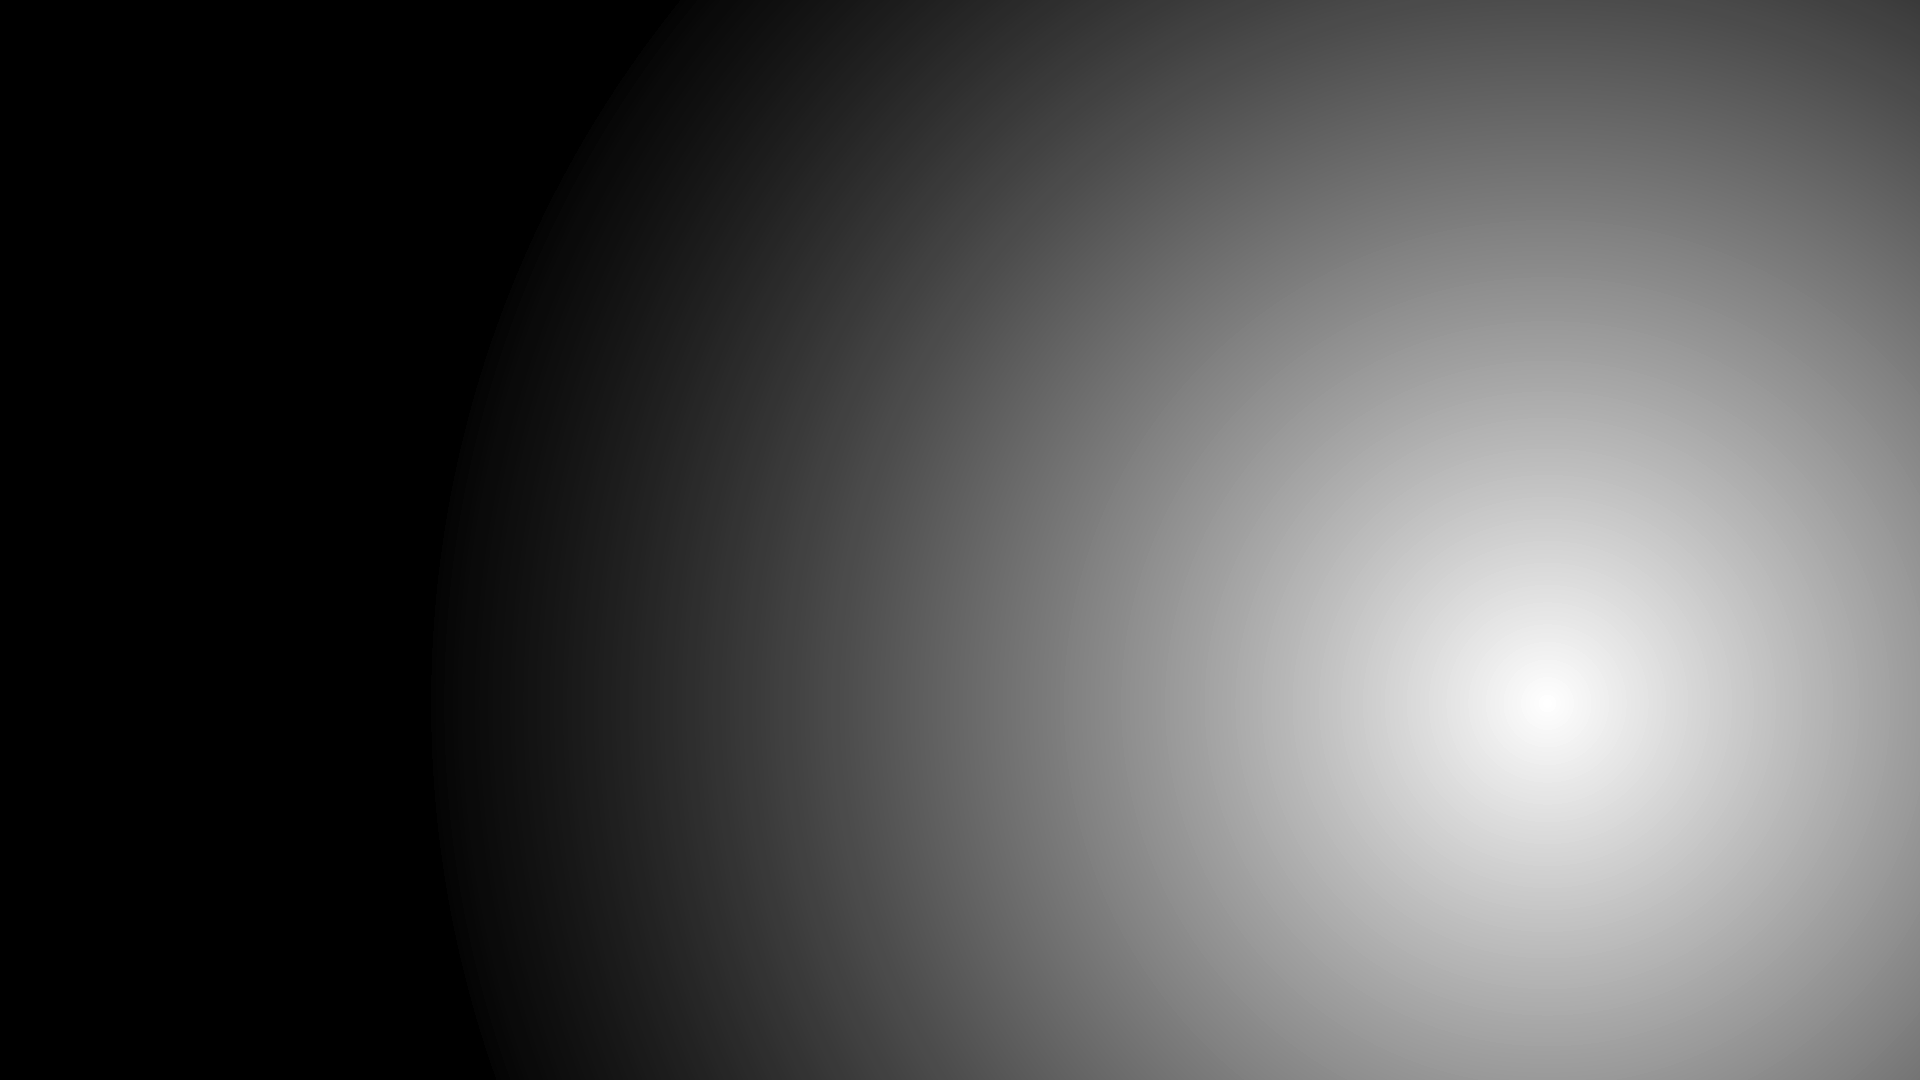 contentuploads201303Black and White Desktop Wallpaper Circularpng 1920x1080